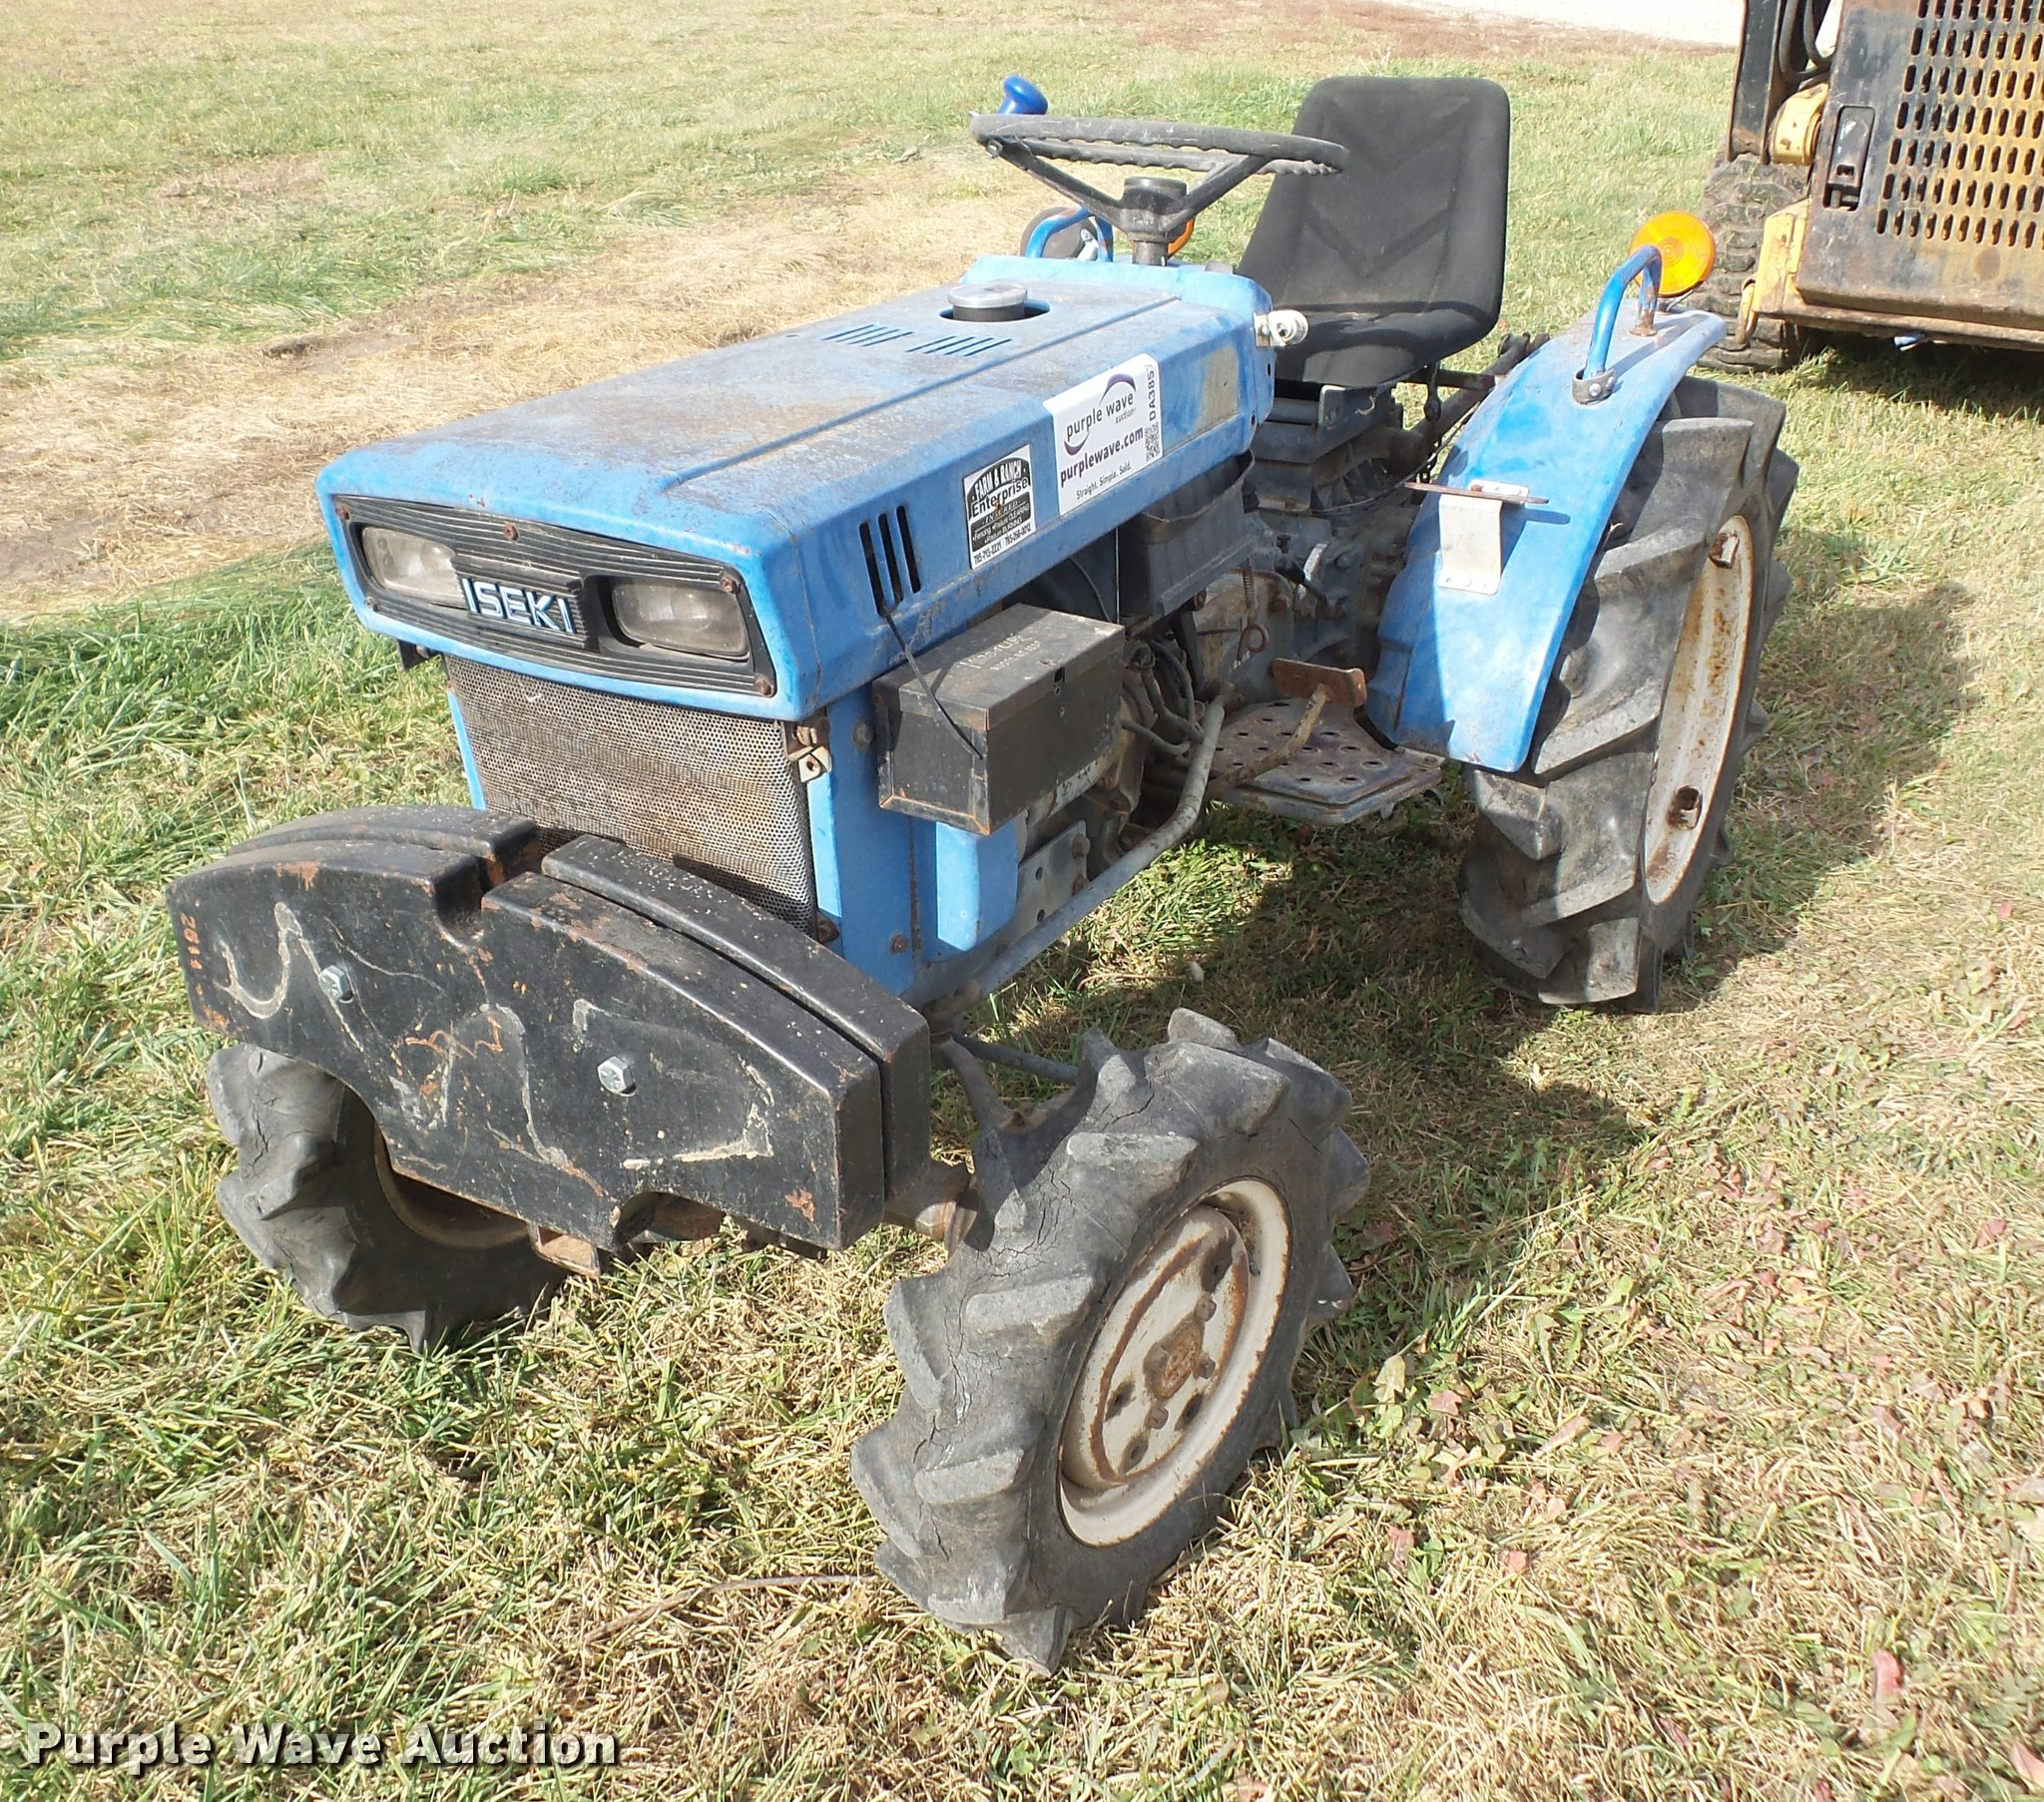 Iseki TX1500F MFWD tractor | Item DA3857 | SOLD! December 14